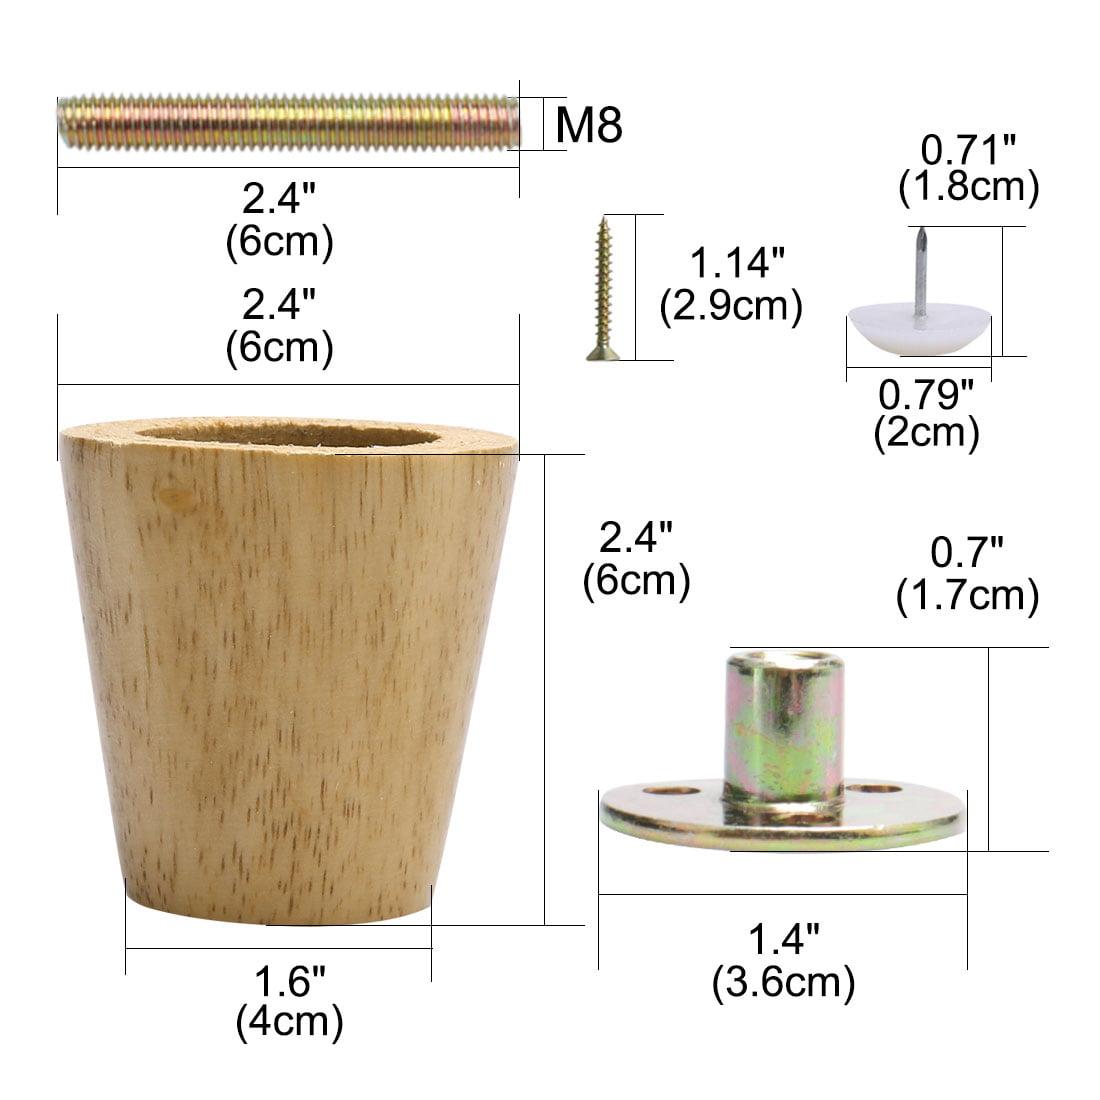 "2.4"" Round Solid Wood Furniture Leg Sofa Desk Feet Adjuster Replacement Set of 4 - image 6 de 7"